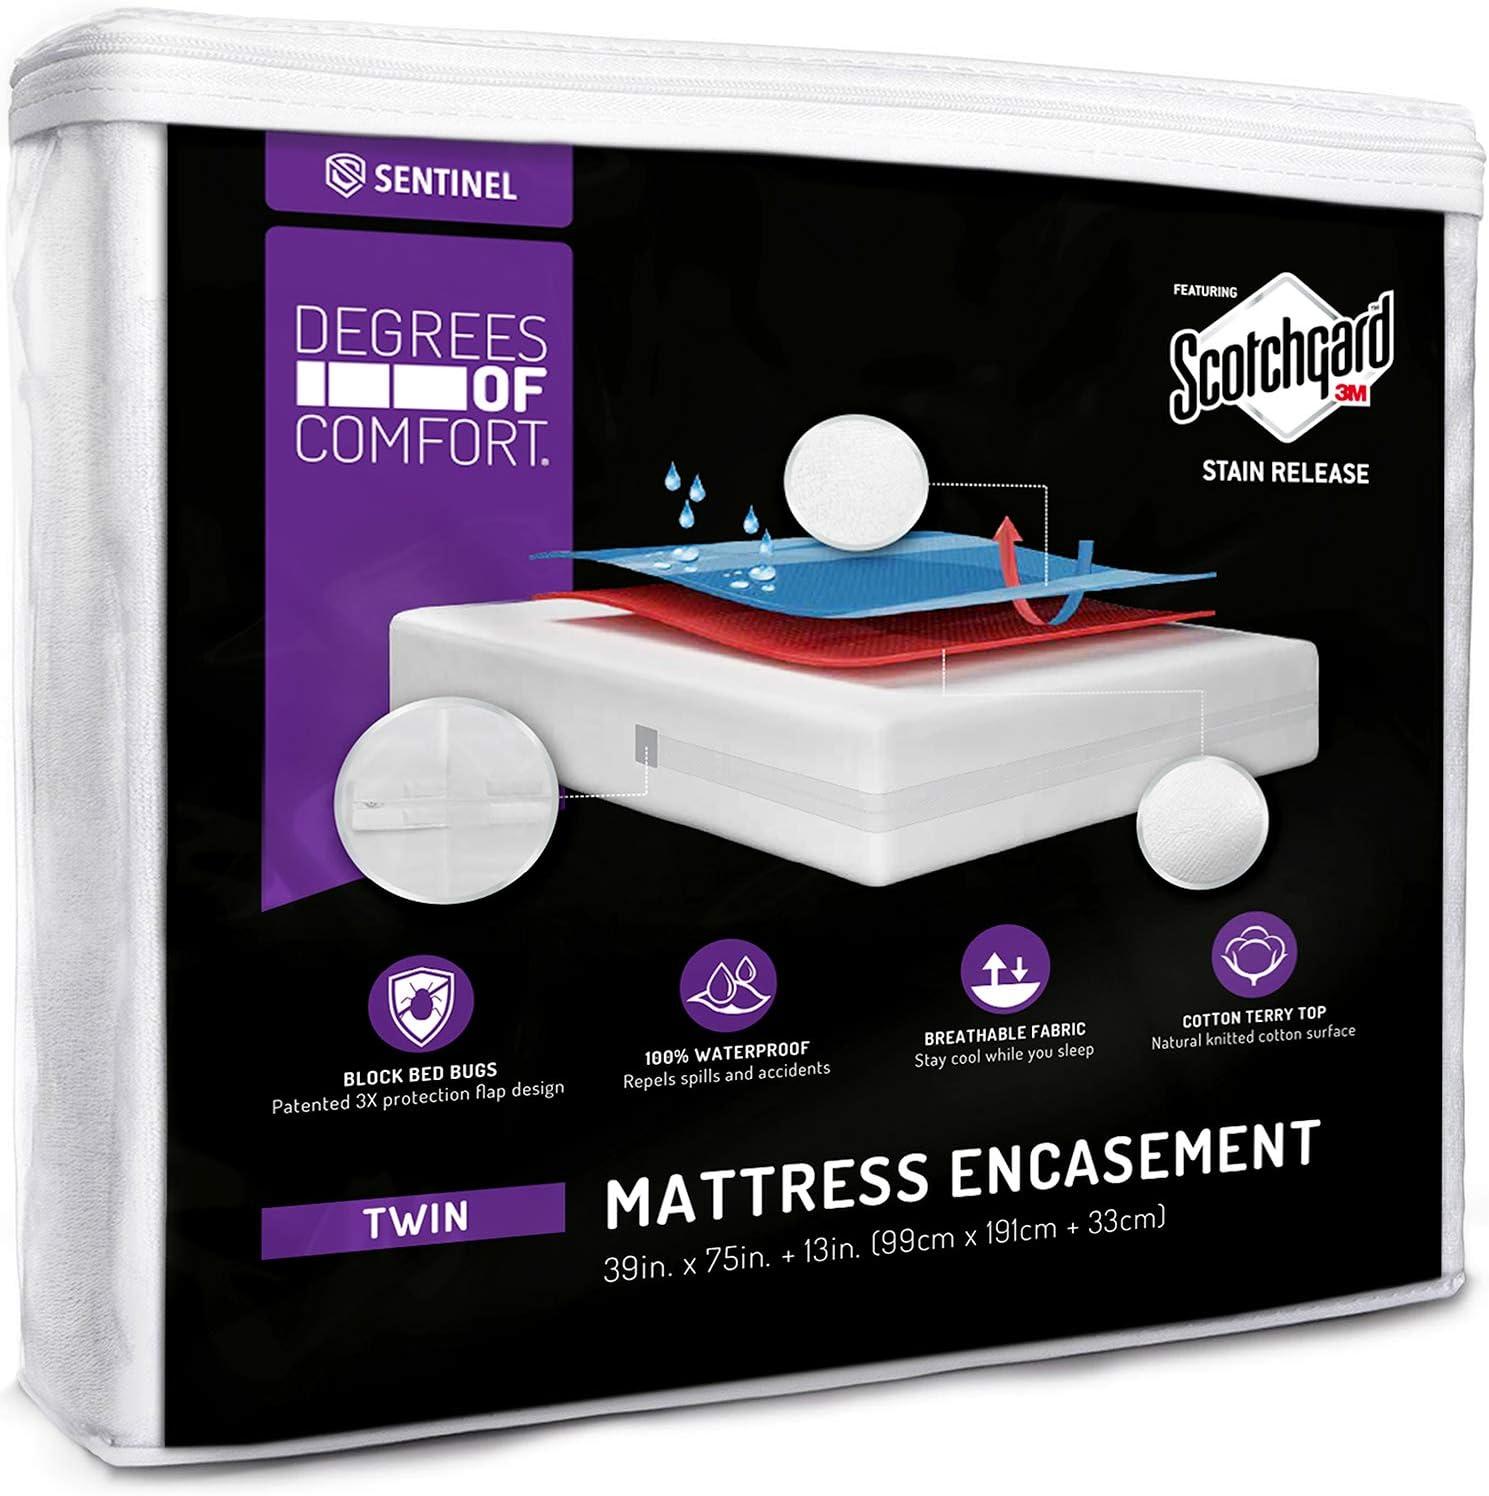 SEAL limited product Degrees of Comfort Zippered Mattress Waterproof Twin Luxury goods Encasement